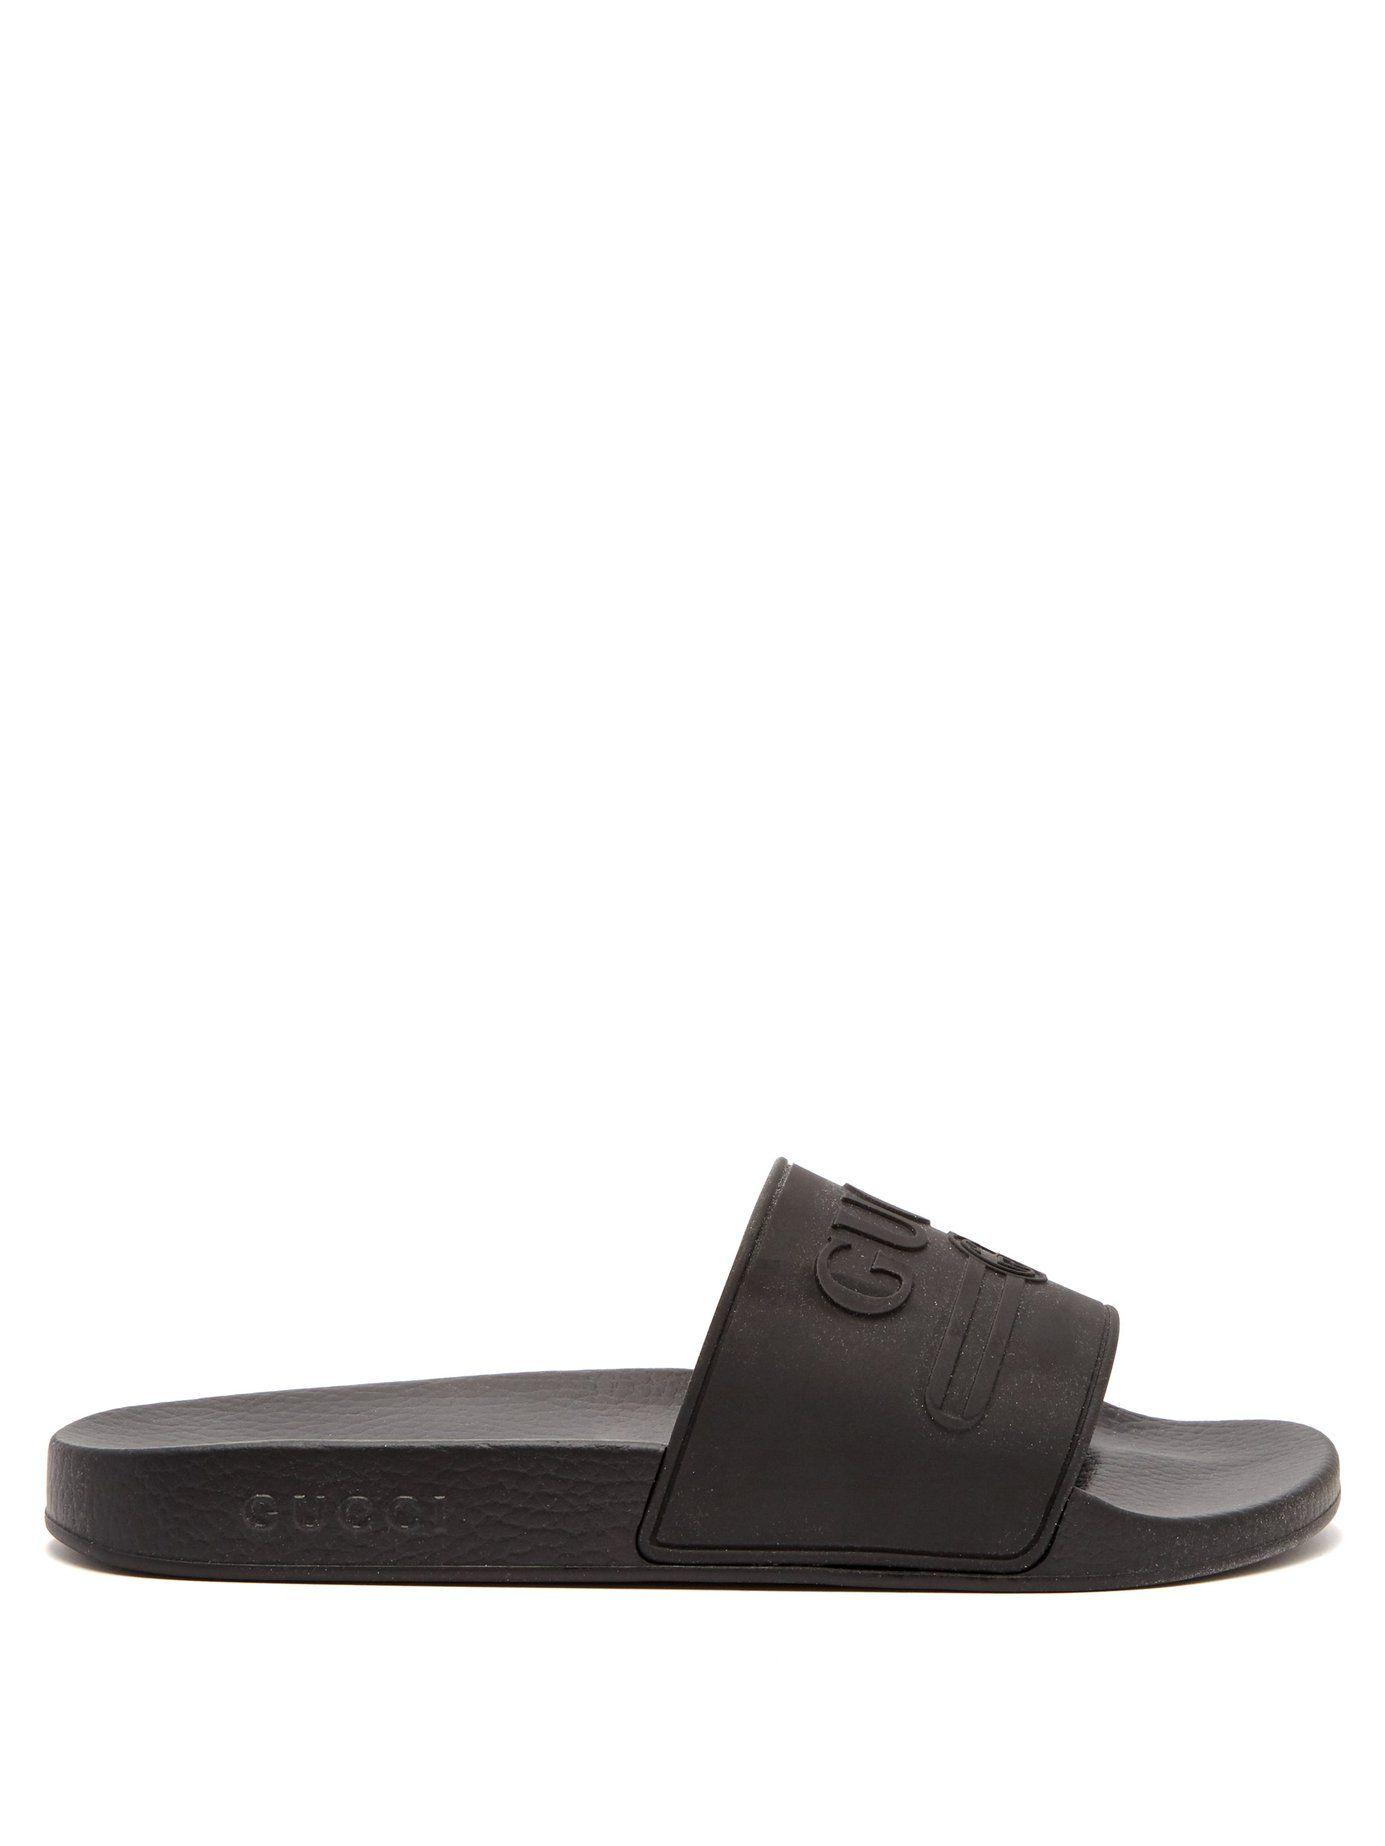 90ef3b5cb650 GUCCI GUCCI - LOGO EMBOSSED RUBBER SLIDES - MENS - BLACK.  gucci  shoes